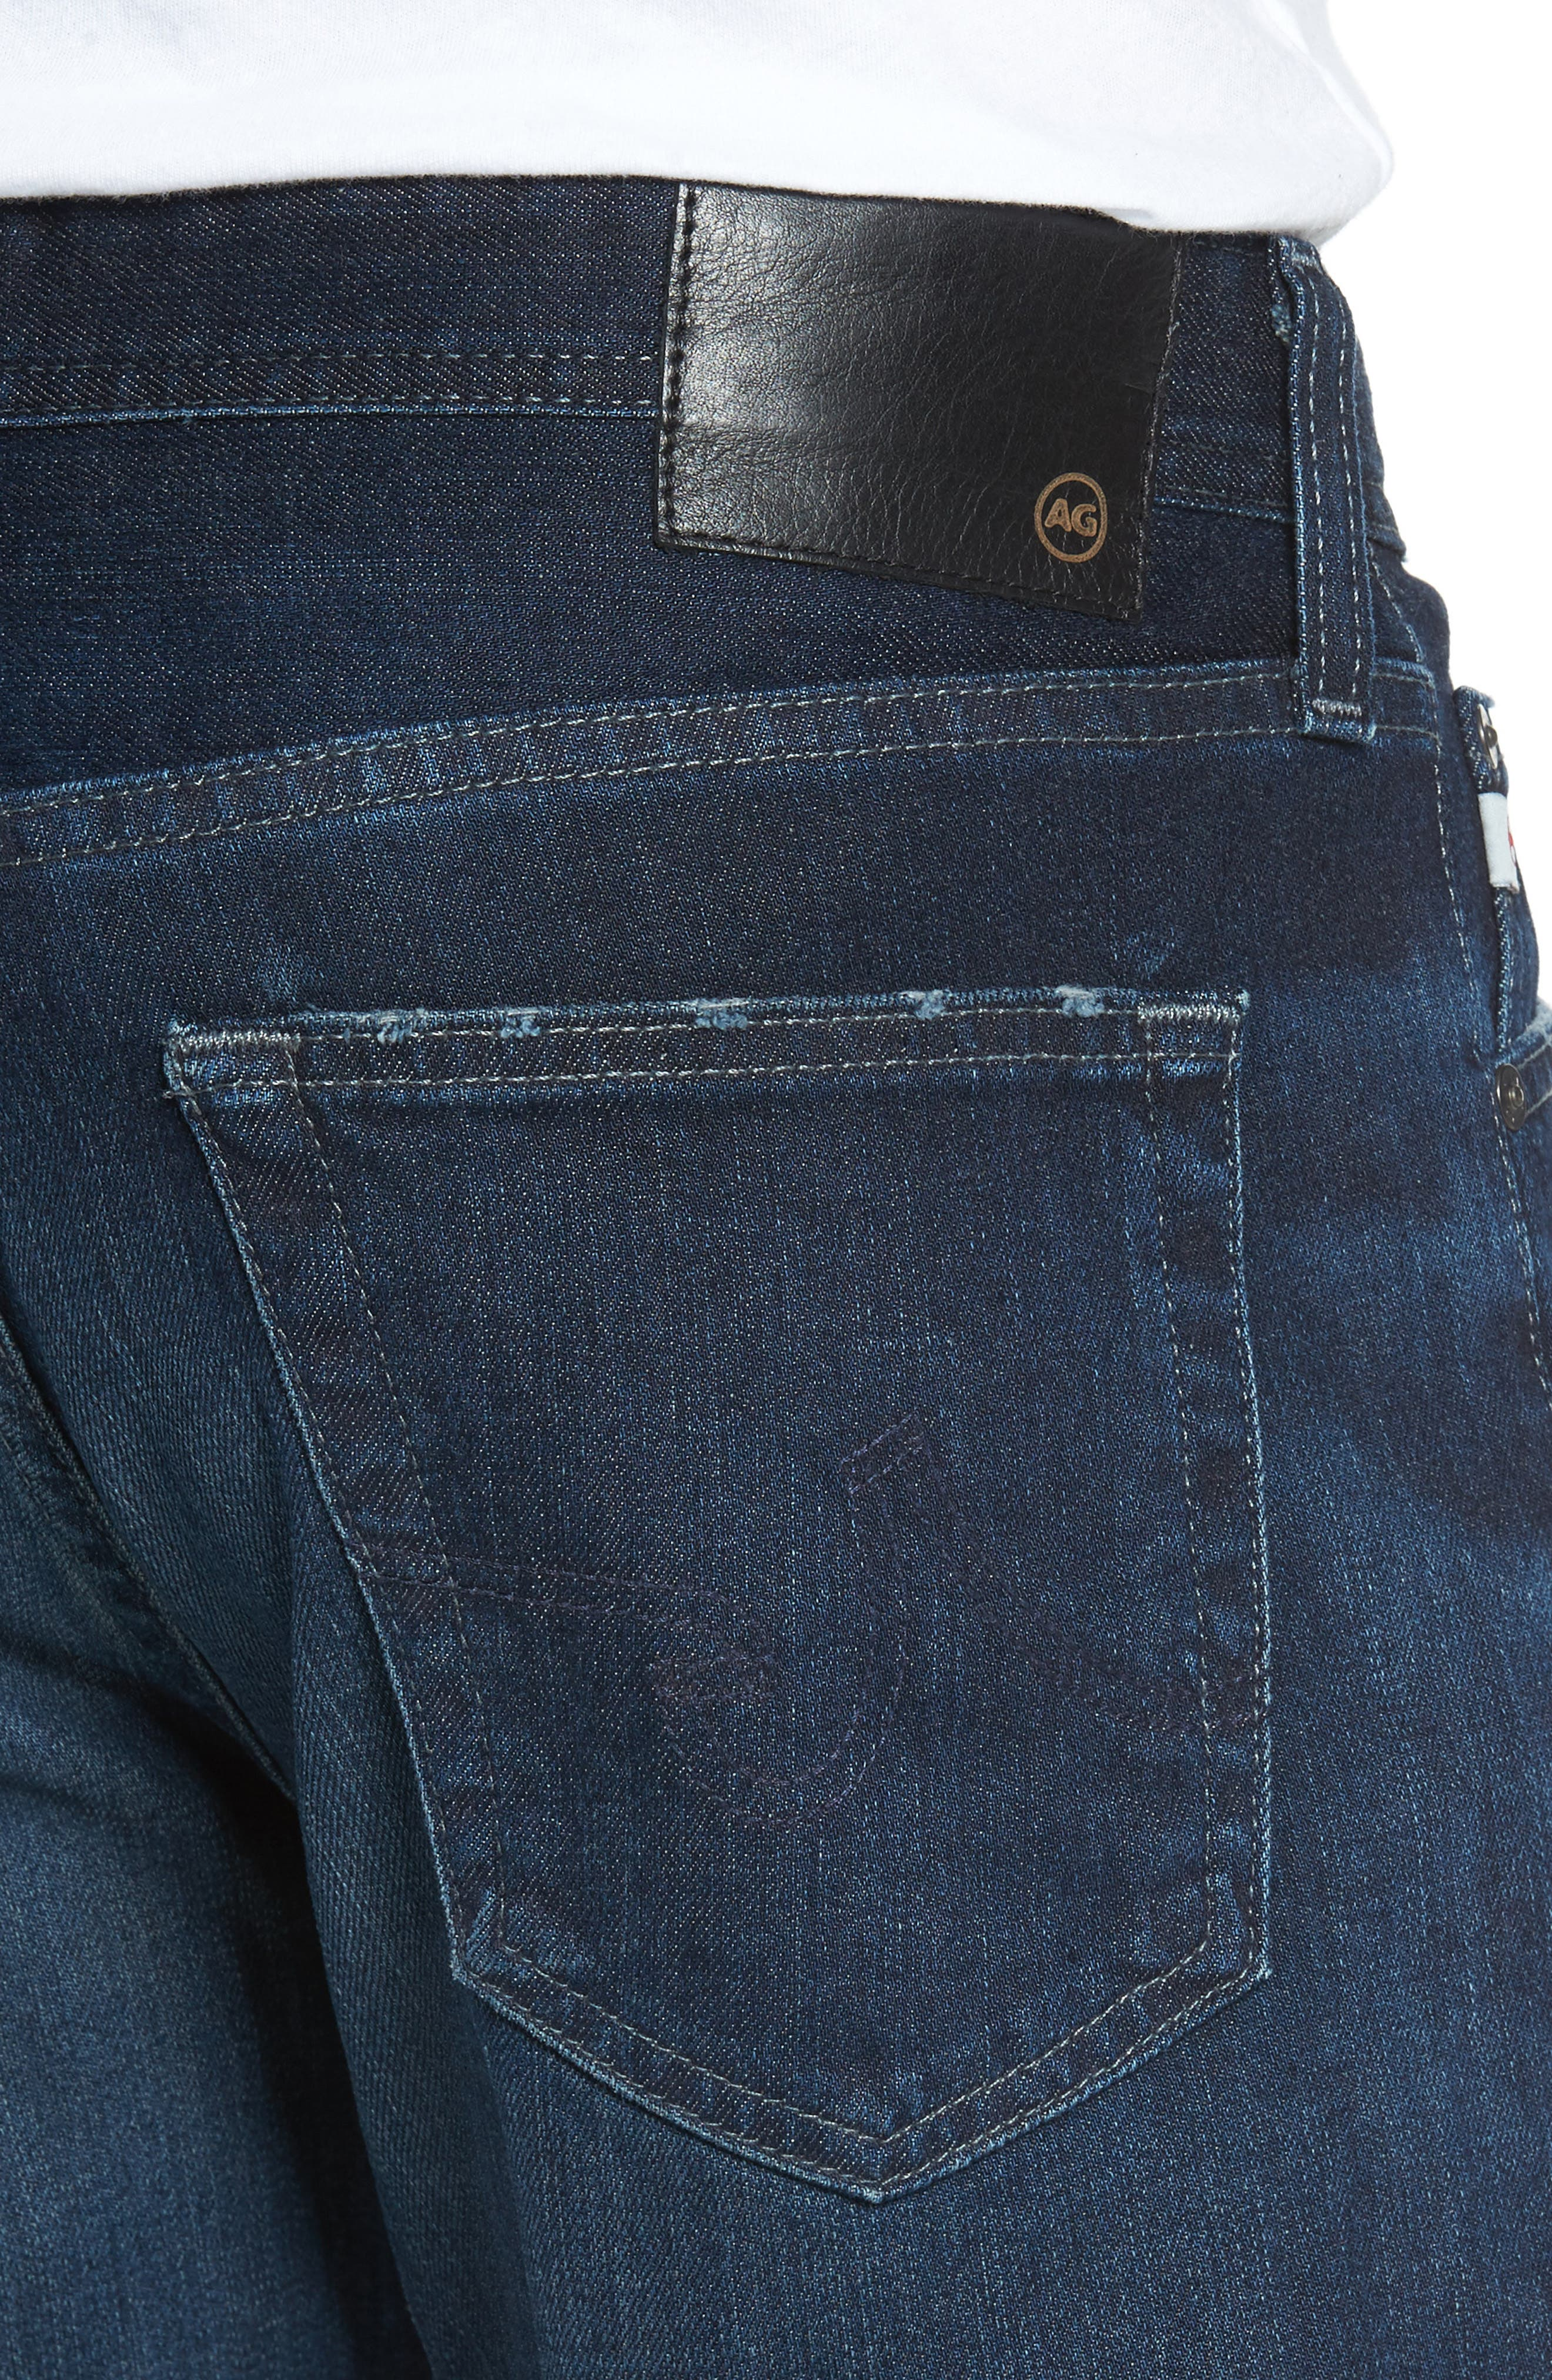 Graduate Slim Straight Fit Jeans,                             Alternate thumbnail 4, color,                             482